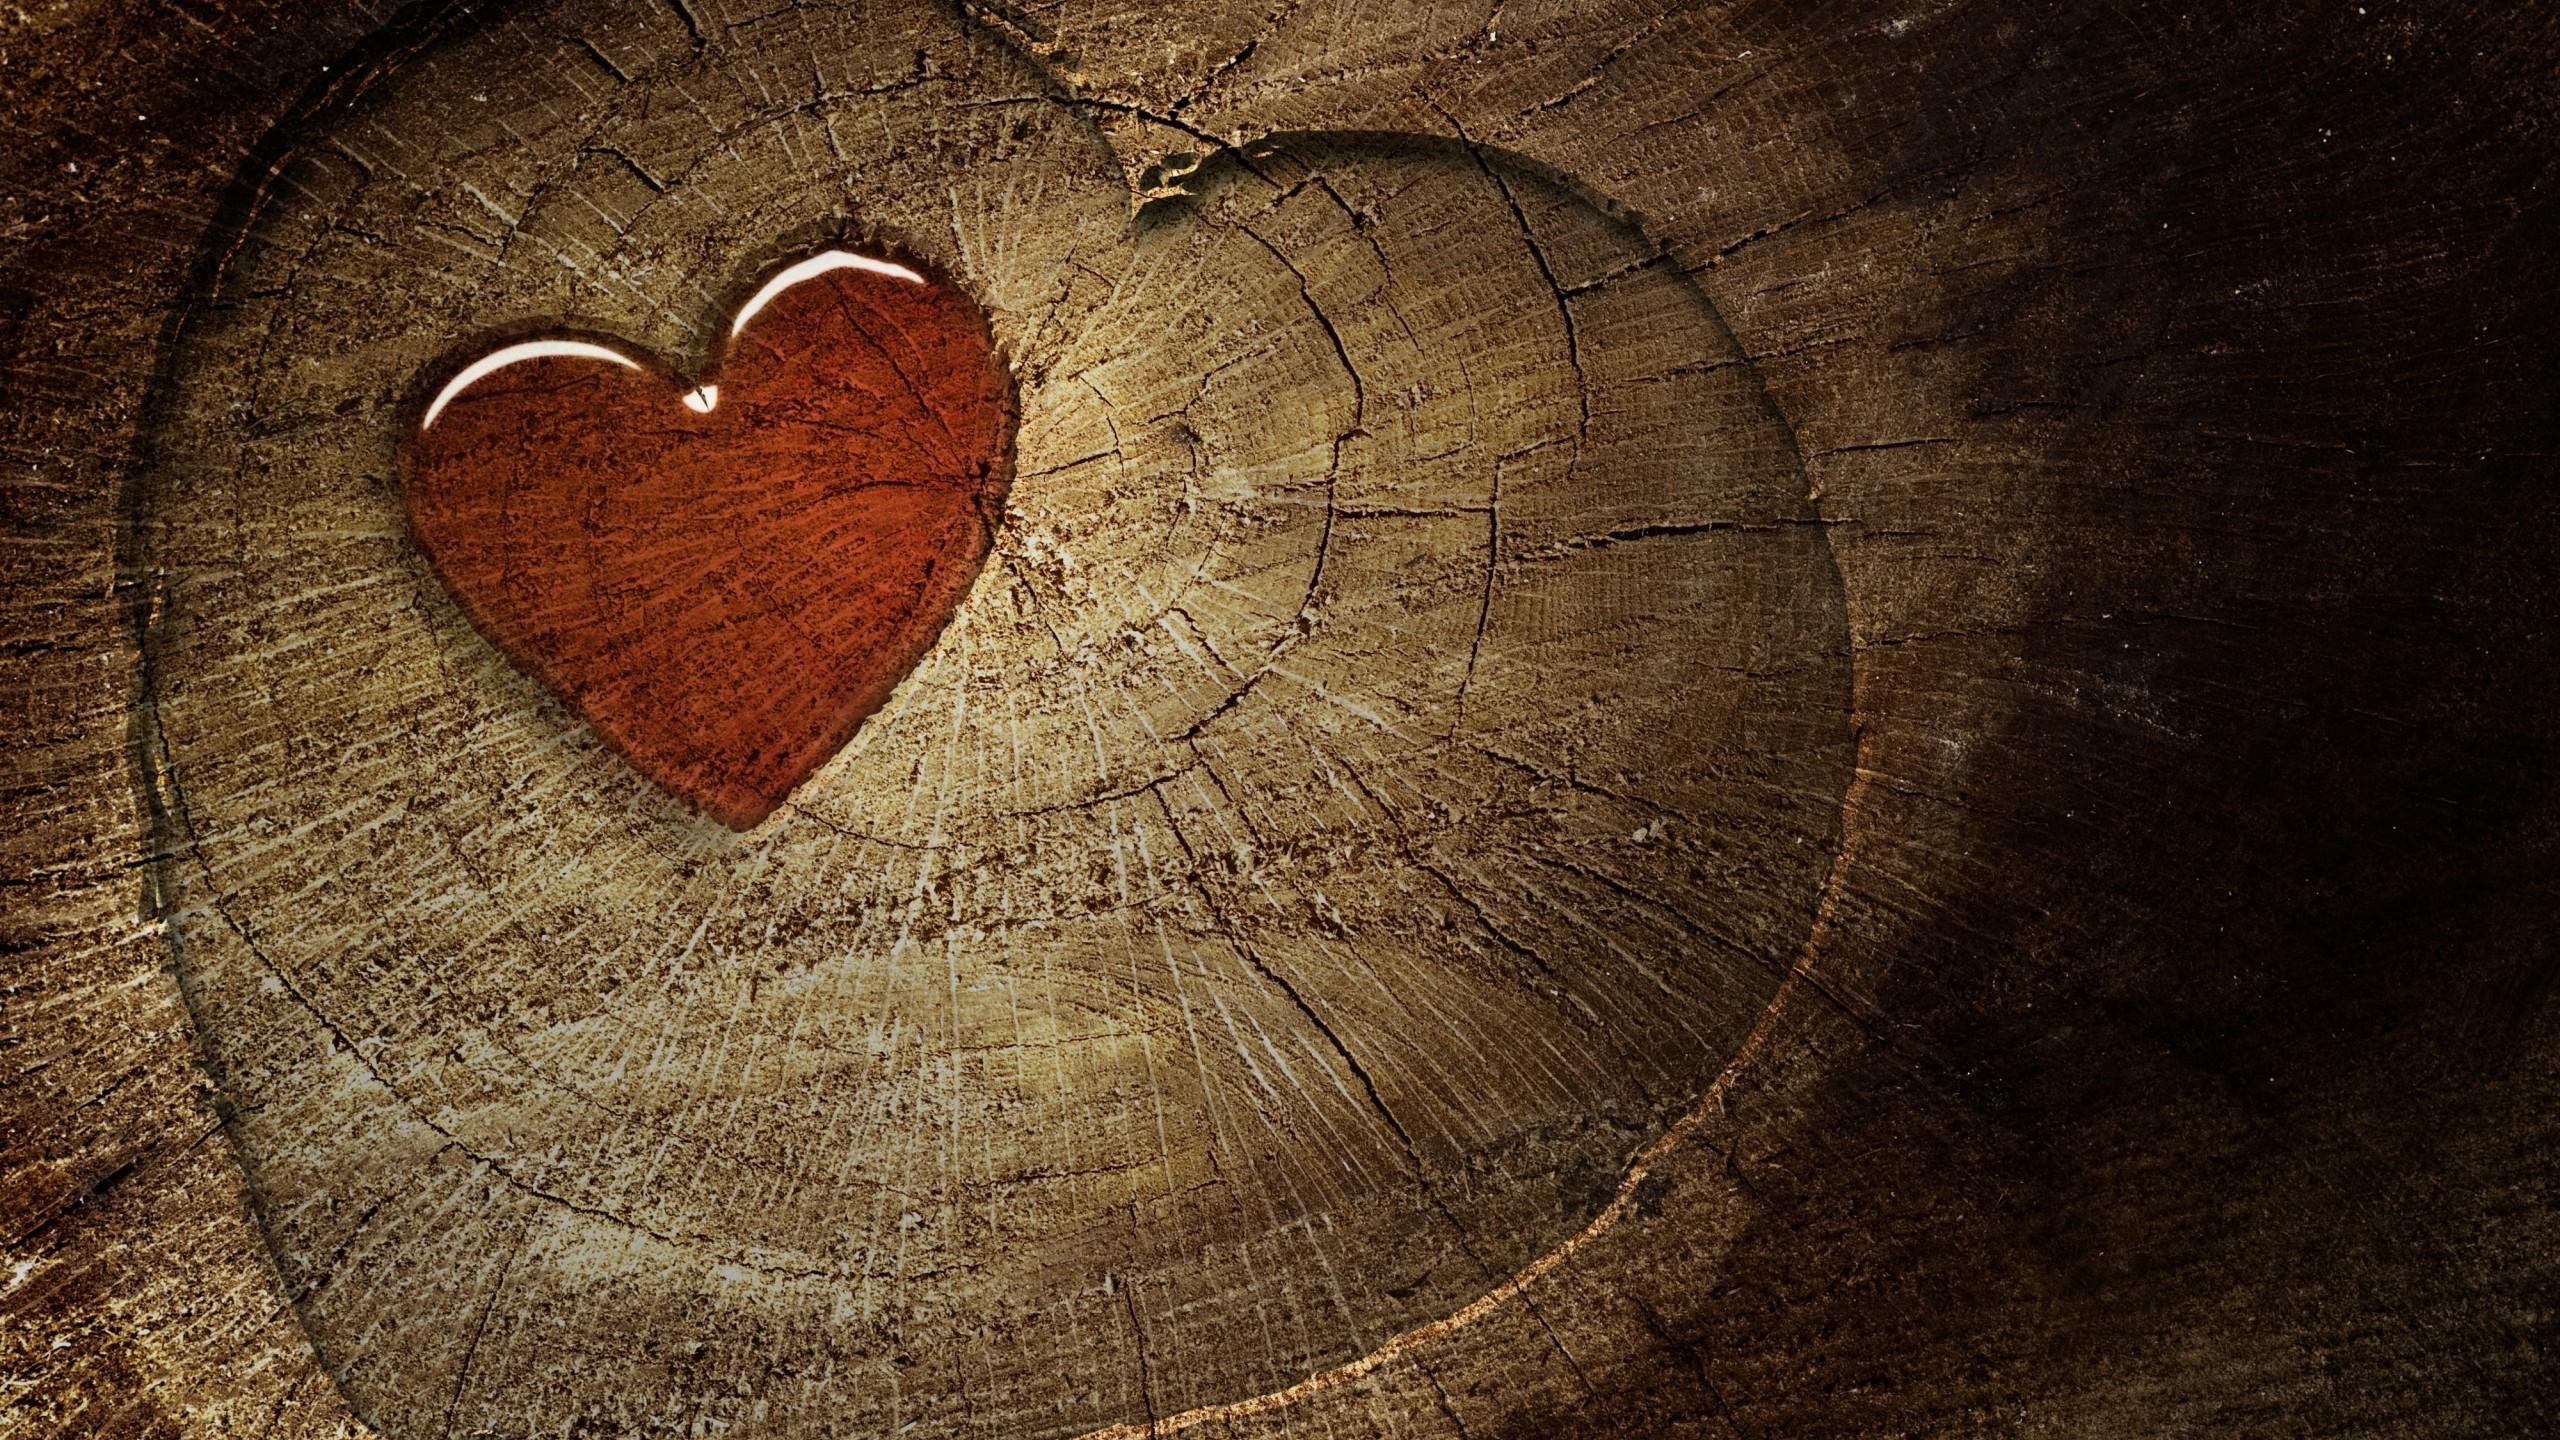 Wood Heart 3D Wallpaper   HQ Wallpapers download 100 high 2560x1440